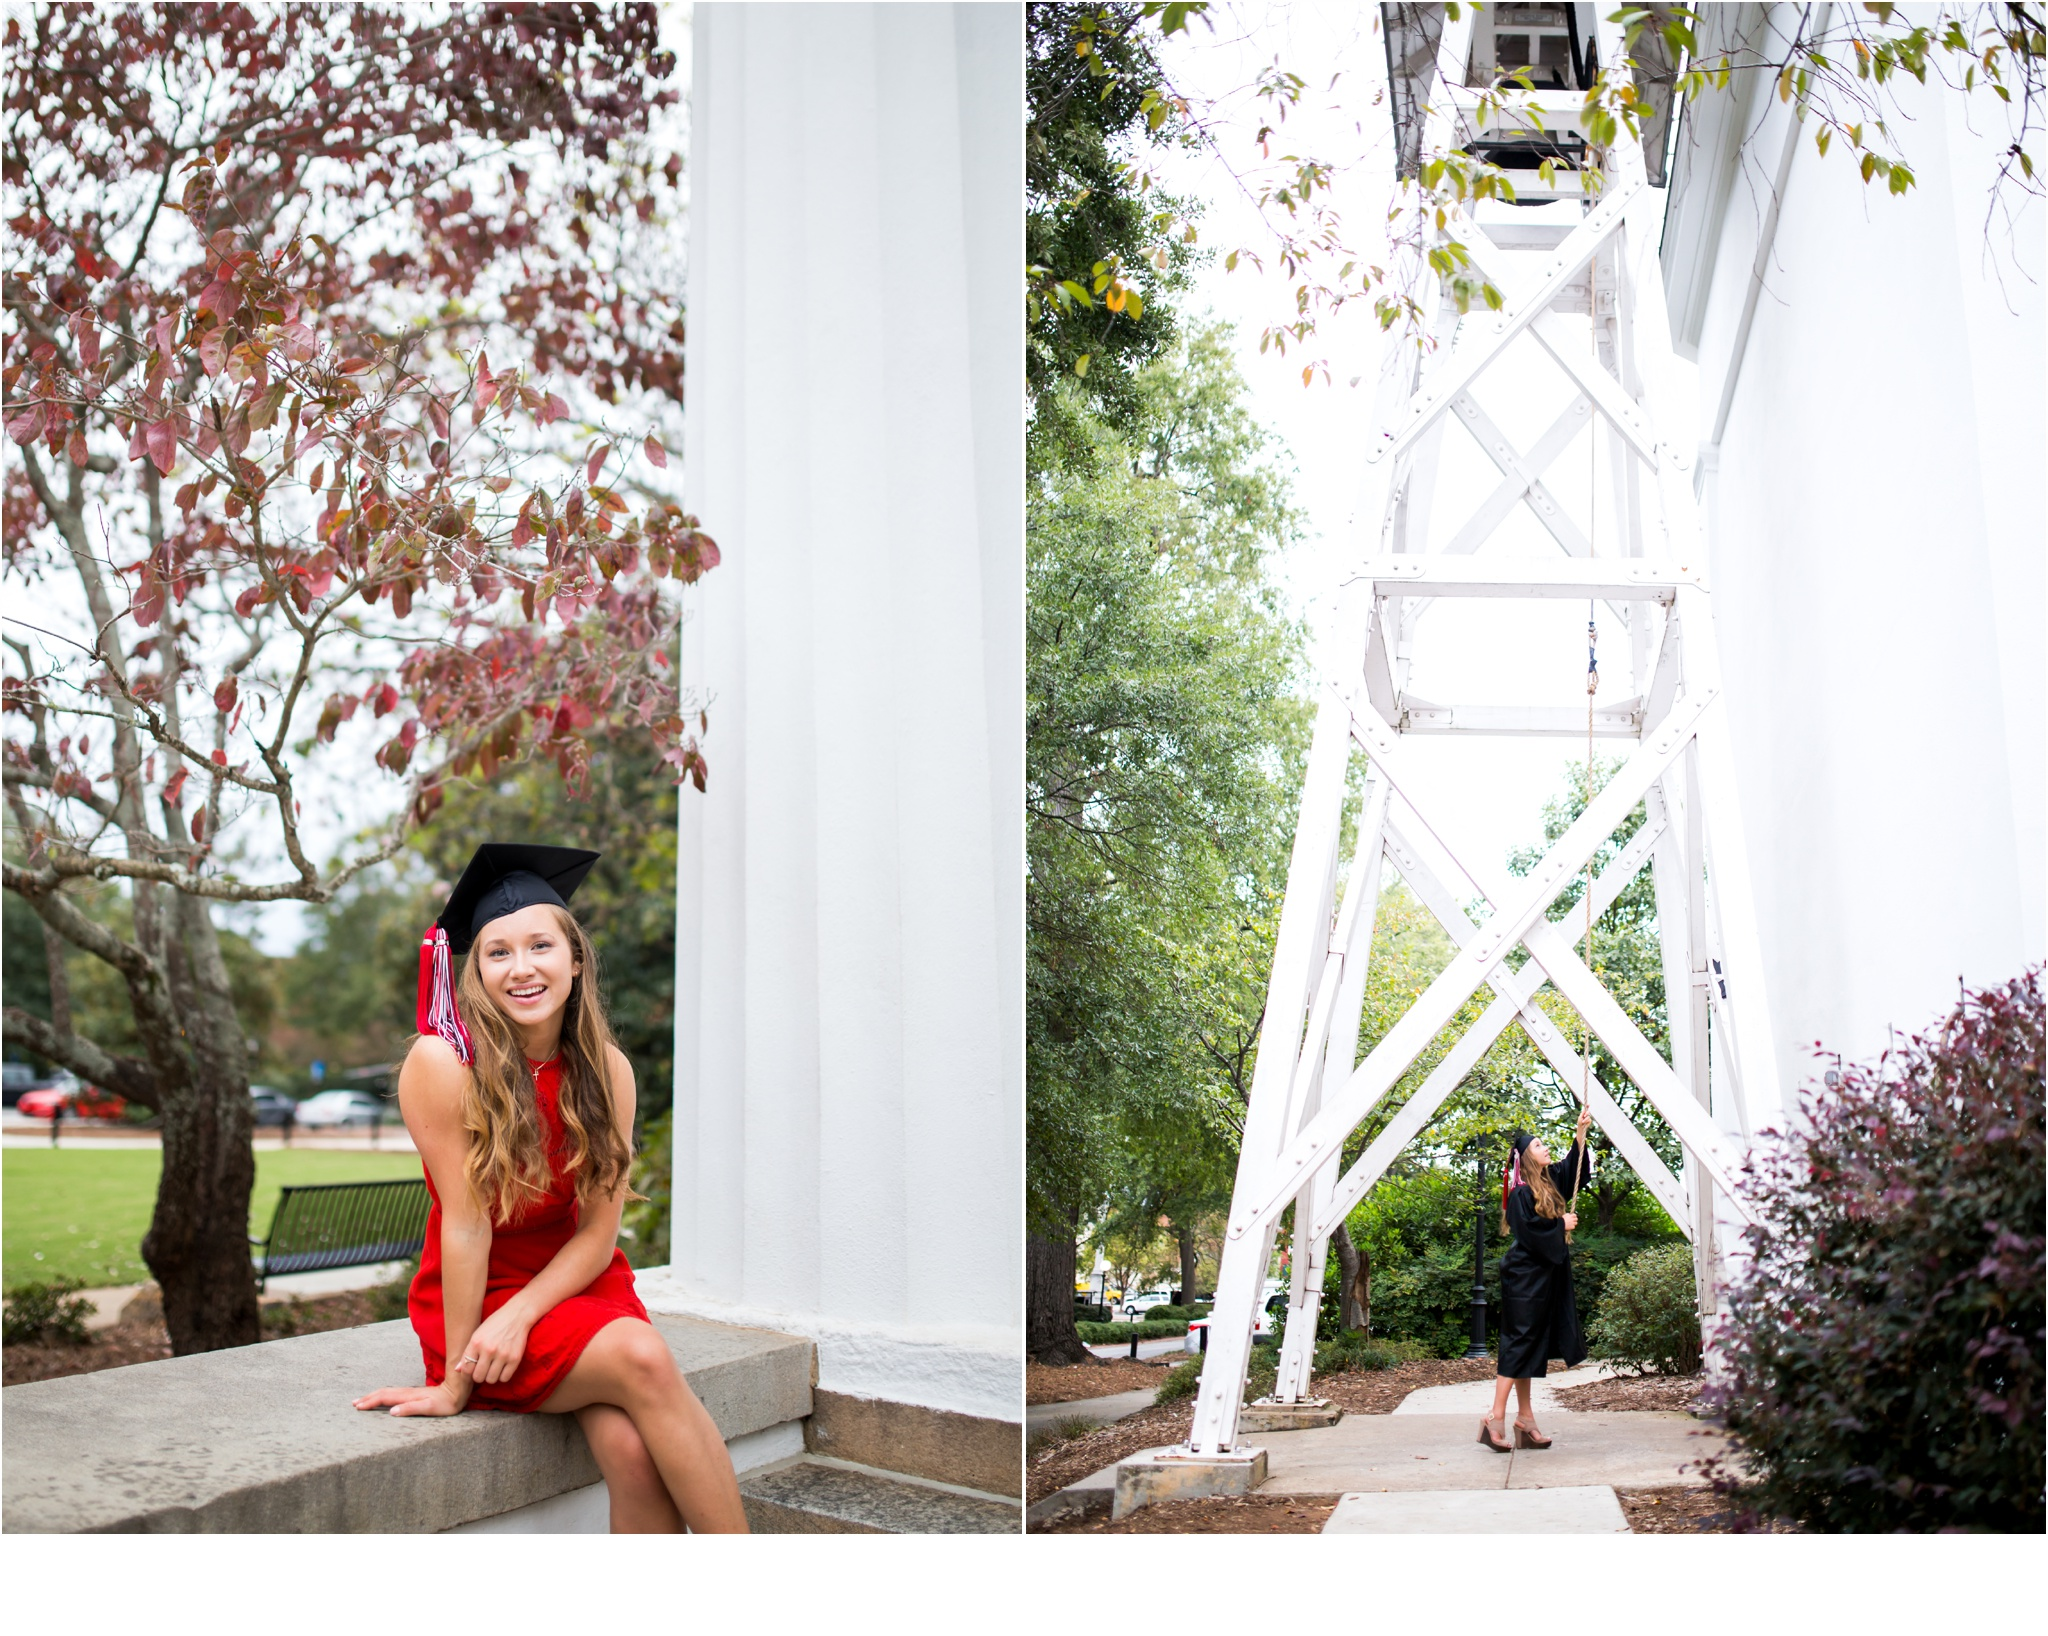 Rainey_Gregg_Photography_St._Simons_Island_Georgia_California_Wedding_Portrait_Photography_0281.jpg